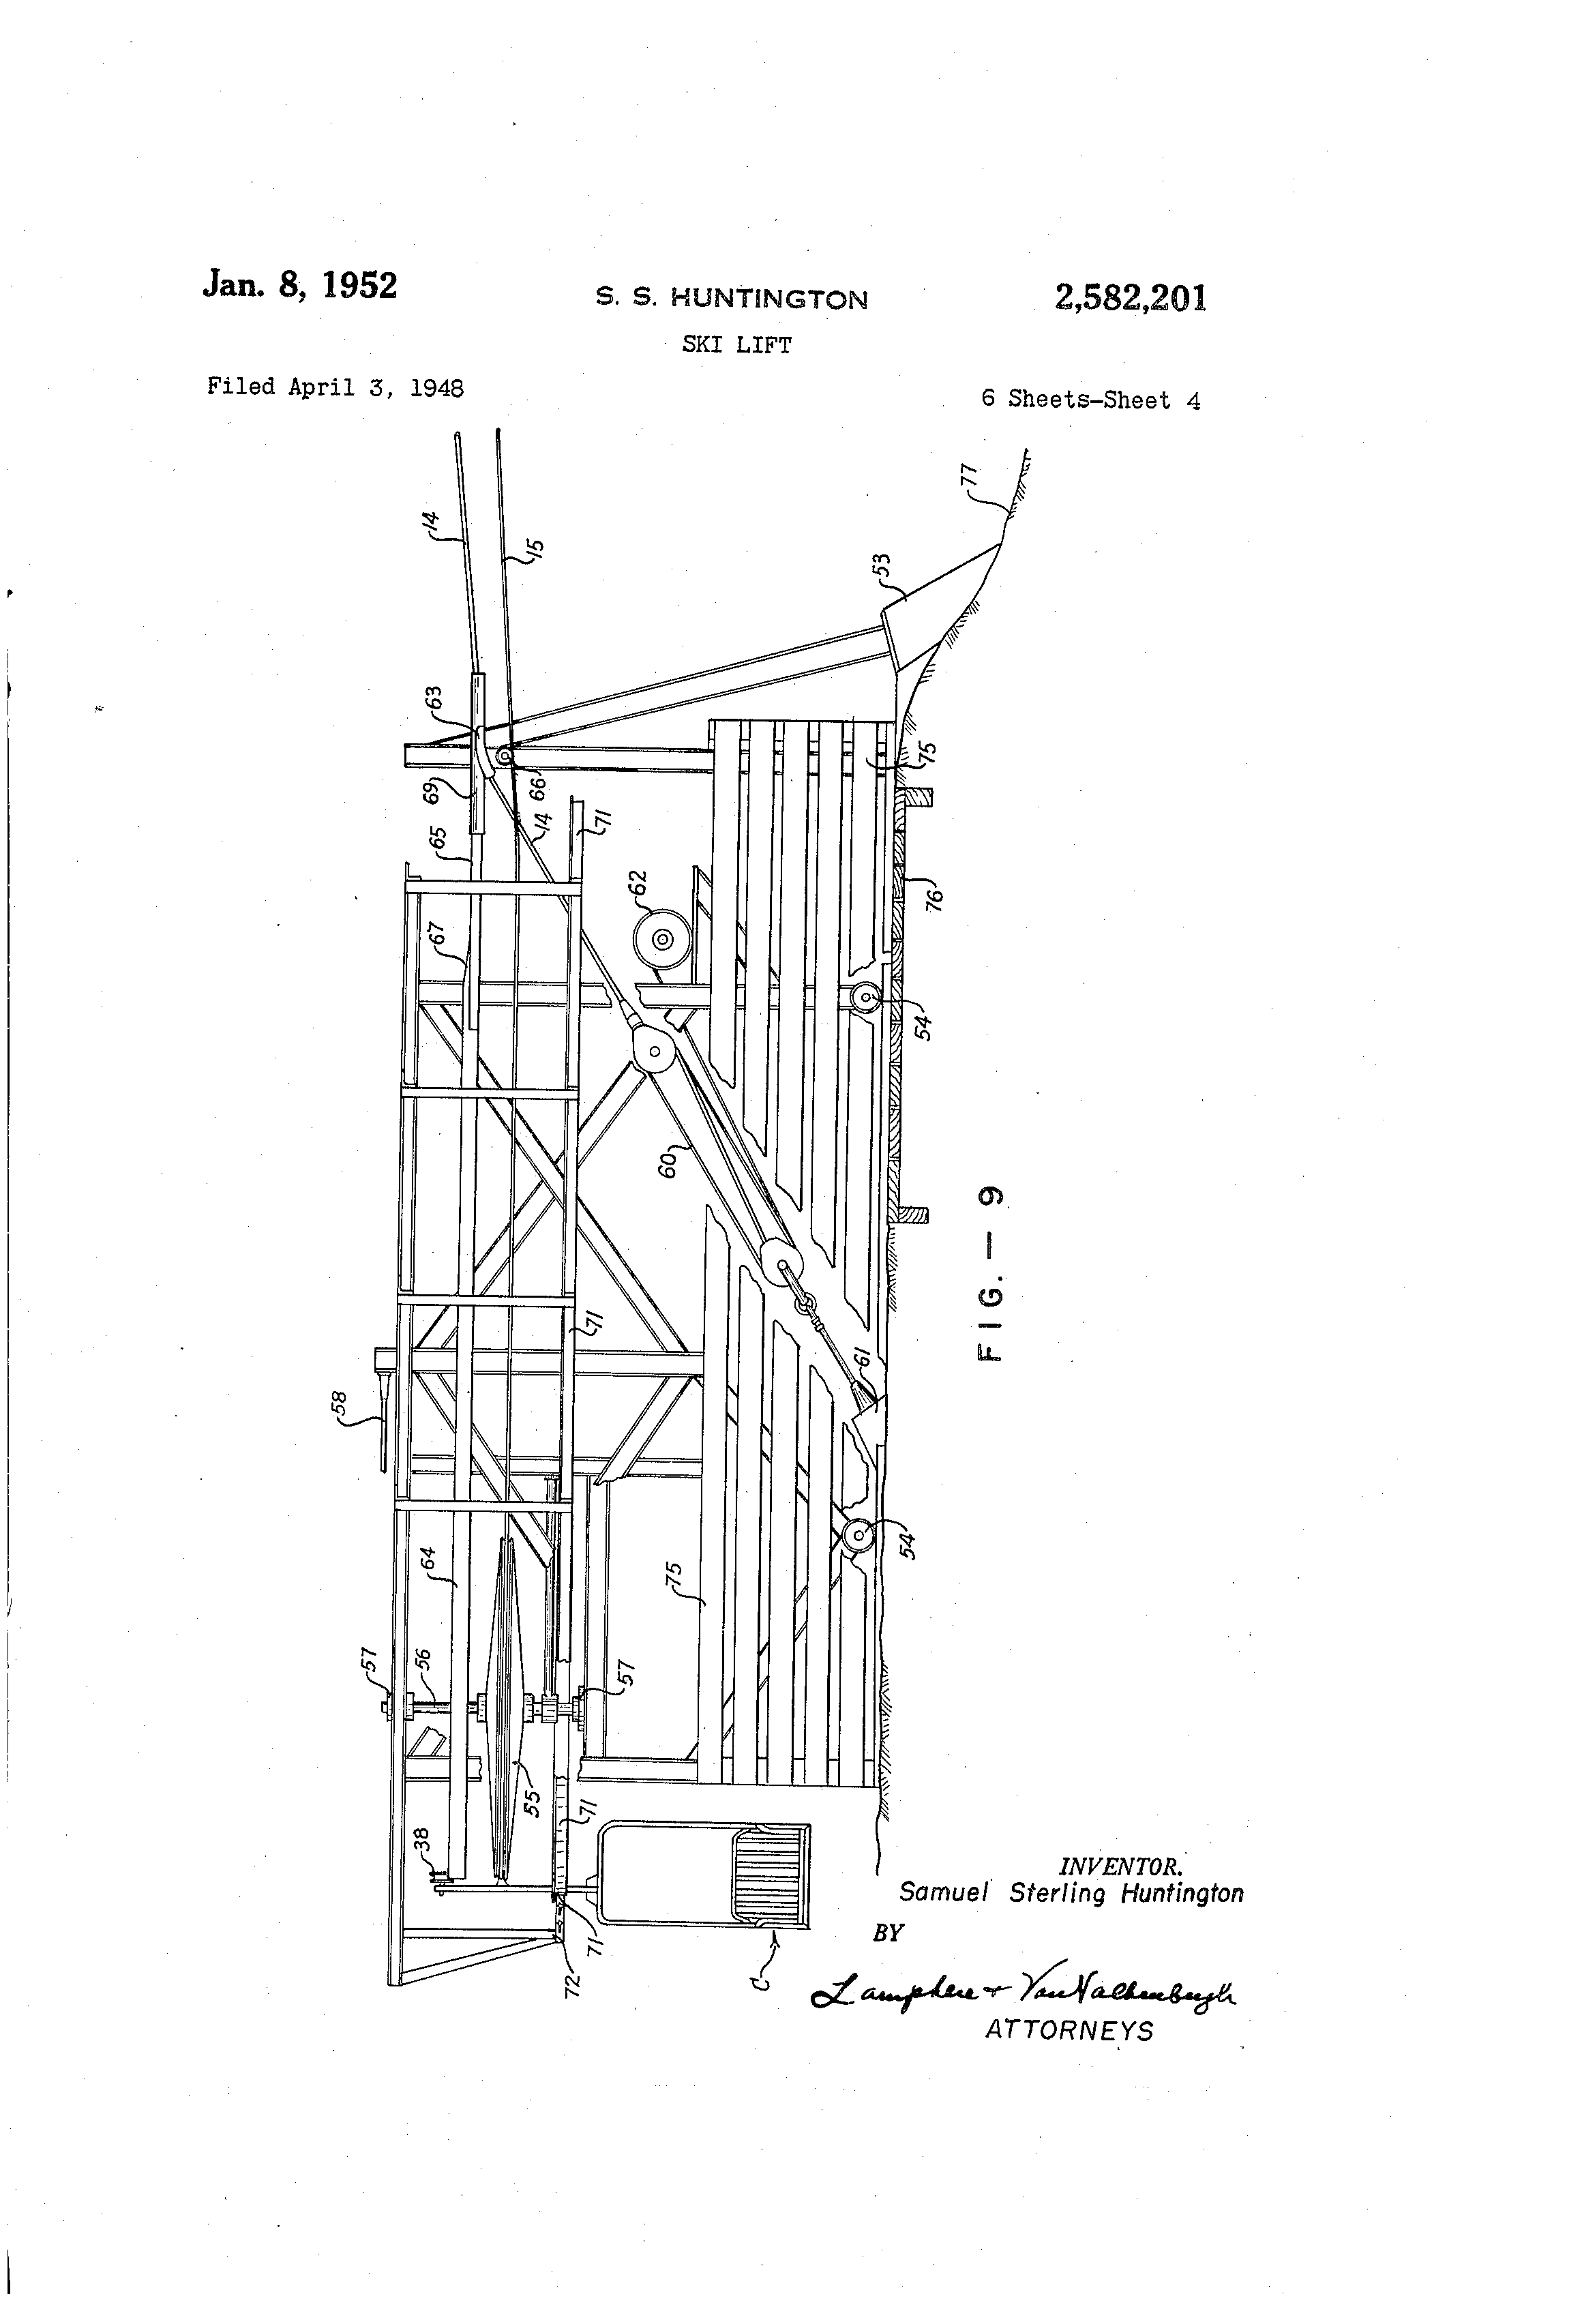 Mk3 mondeo fuse box diagram efcaviation mk3 mondeo fuse box diagram patente us2582201 ski lift google patentesdesign pooptronica